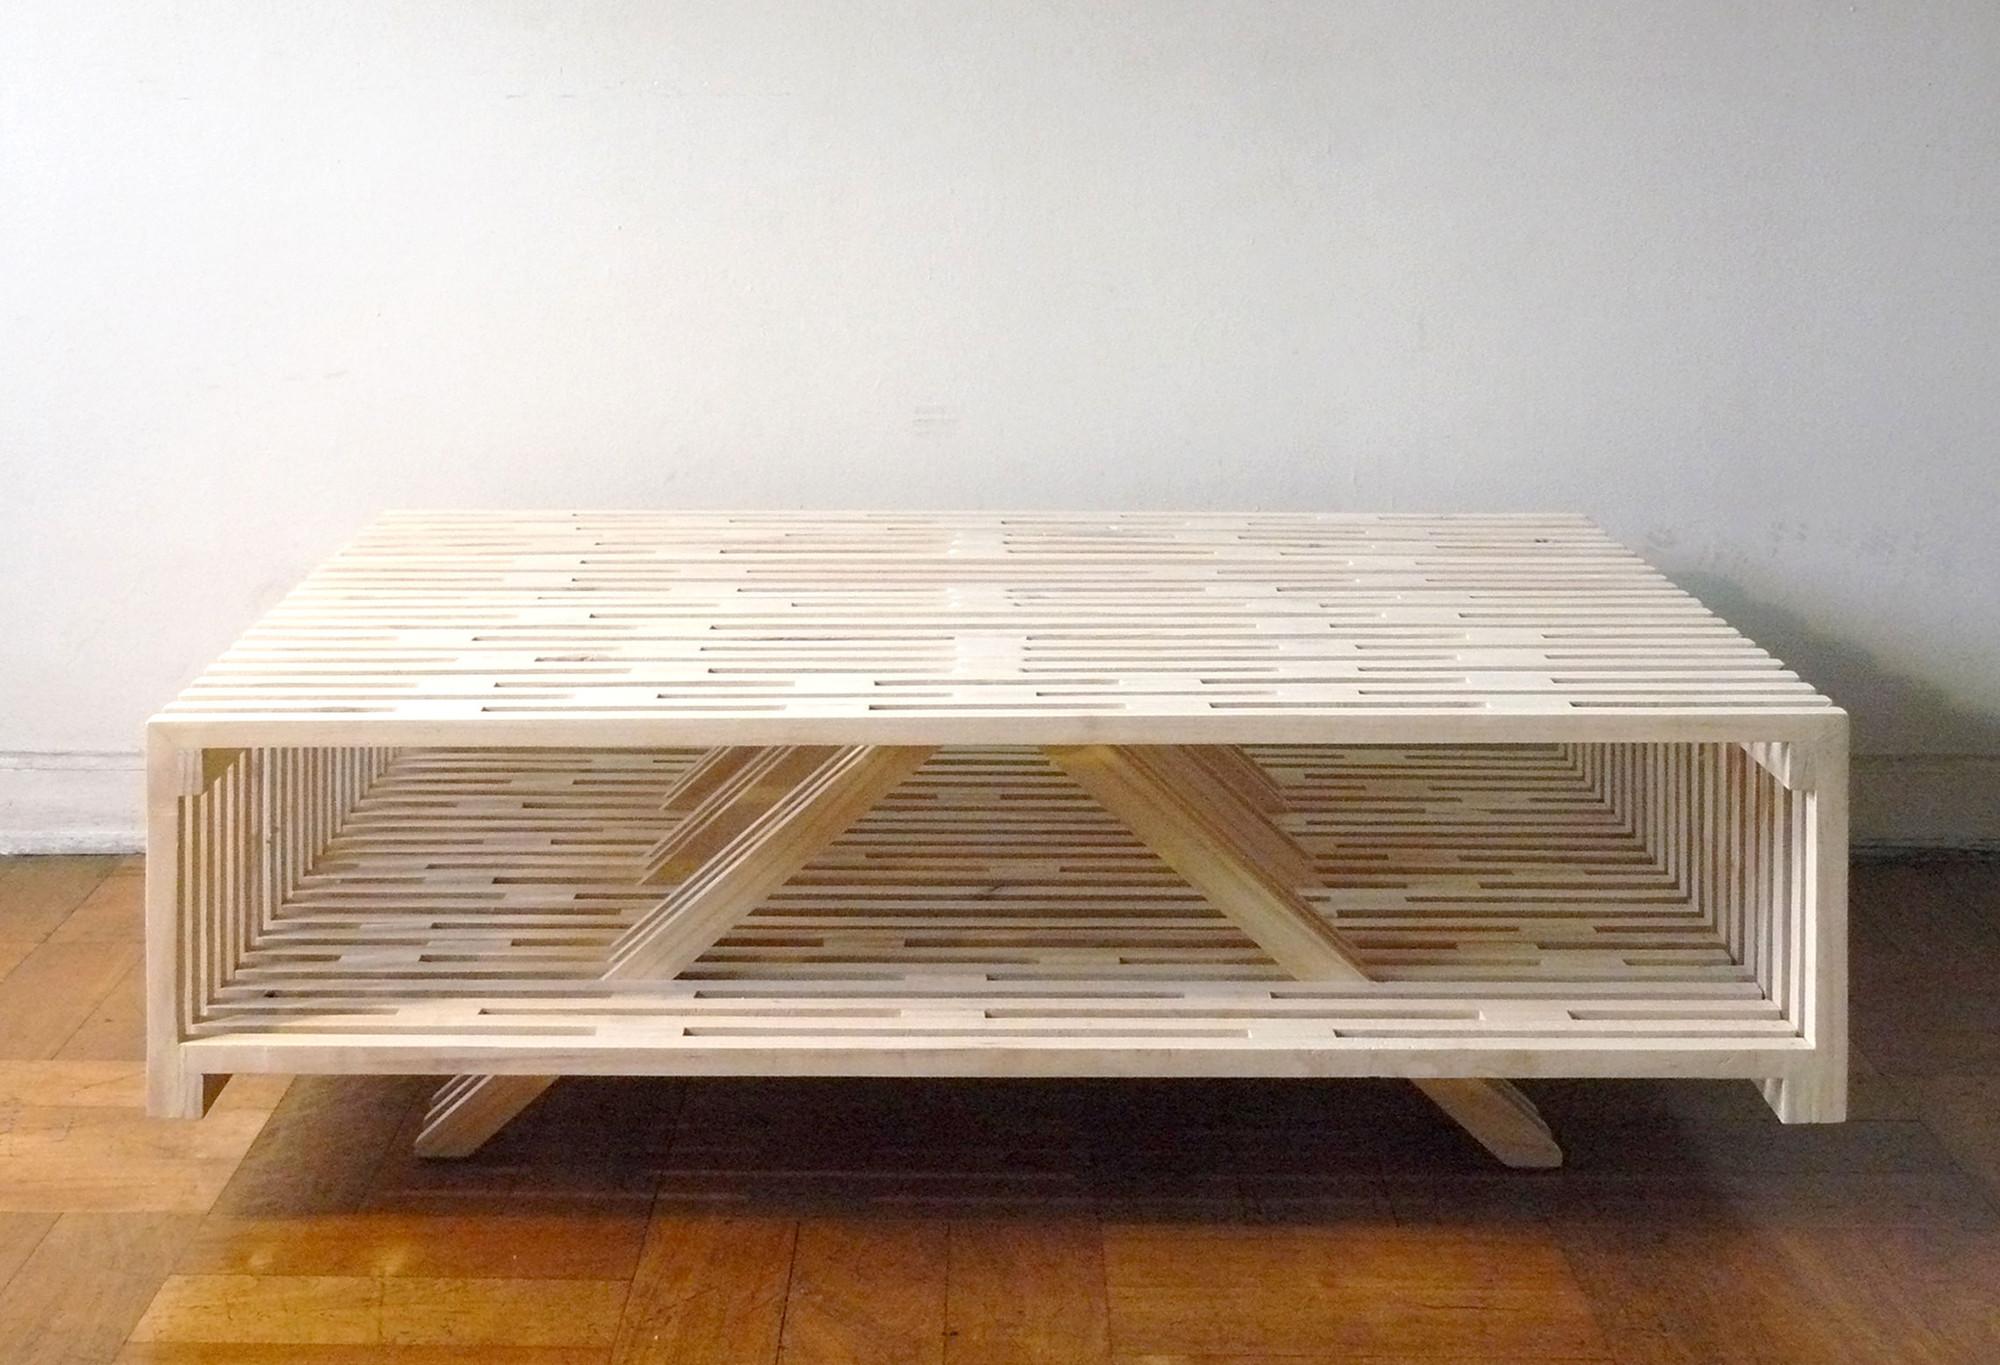 Mesa de centro a sebasti n erazo plataforma arquitectura - Mesas de arquitectura ...